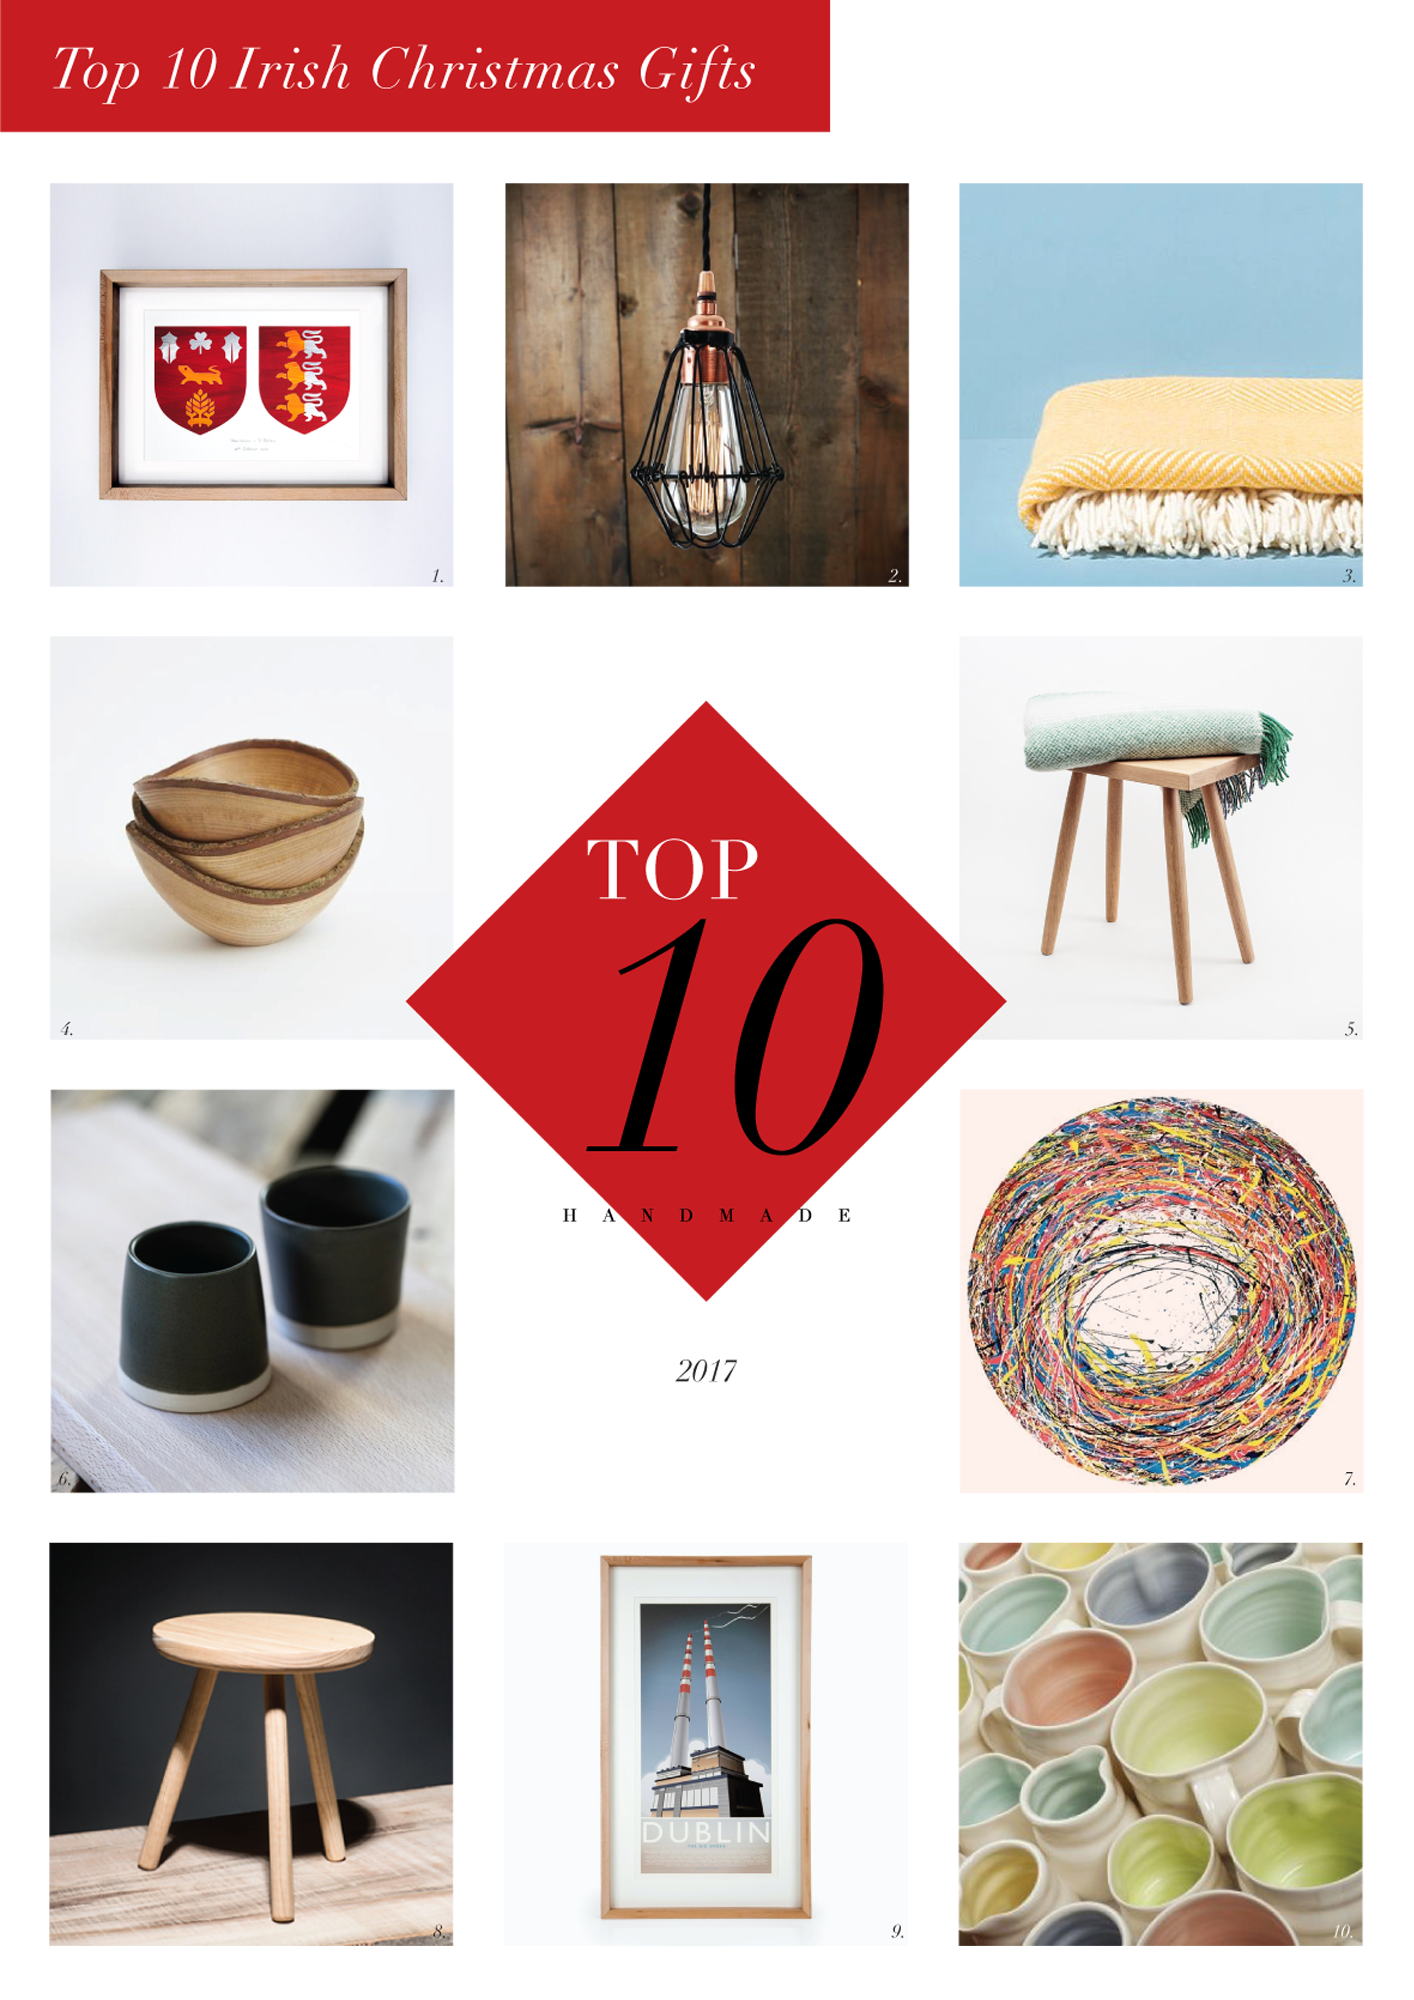 top 10 irish christmas gifts 2017